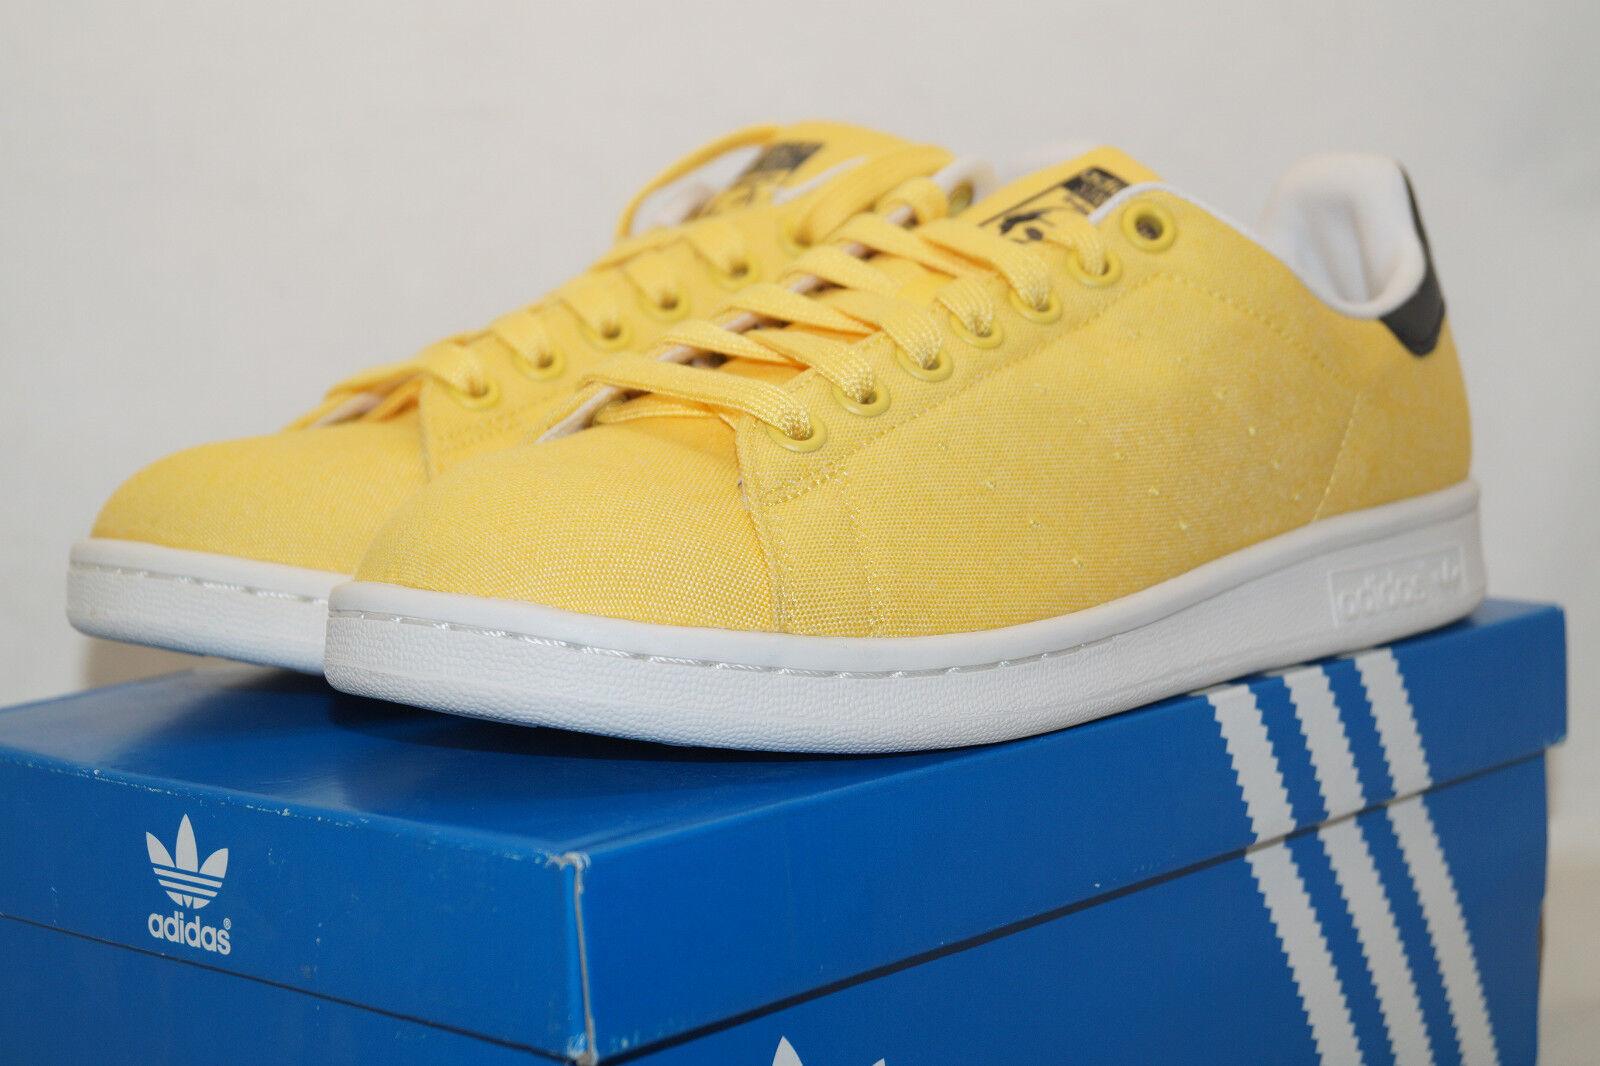 Adidas Originals Stan UE Smith UE Stan Jaune Jaune s75112 Ortholite 14694e